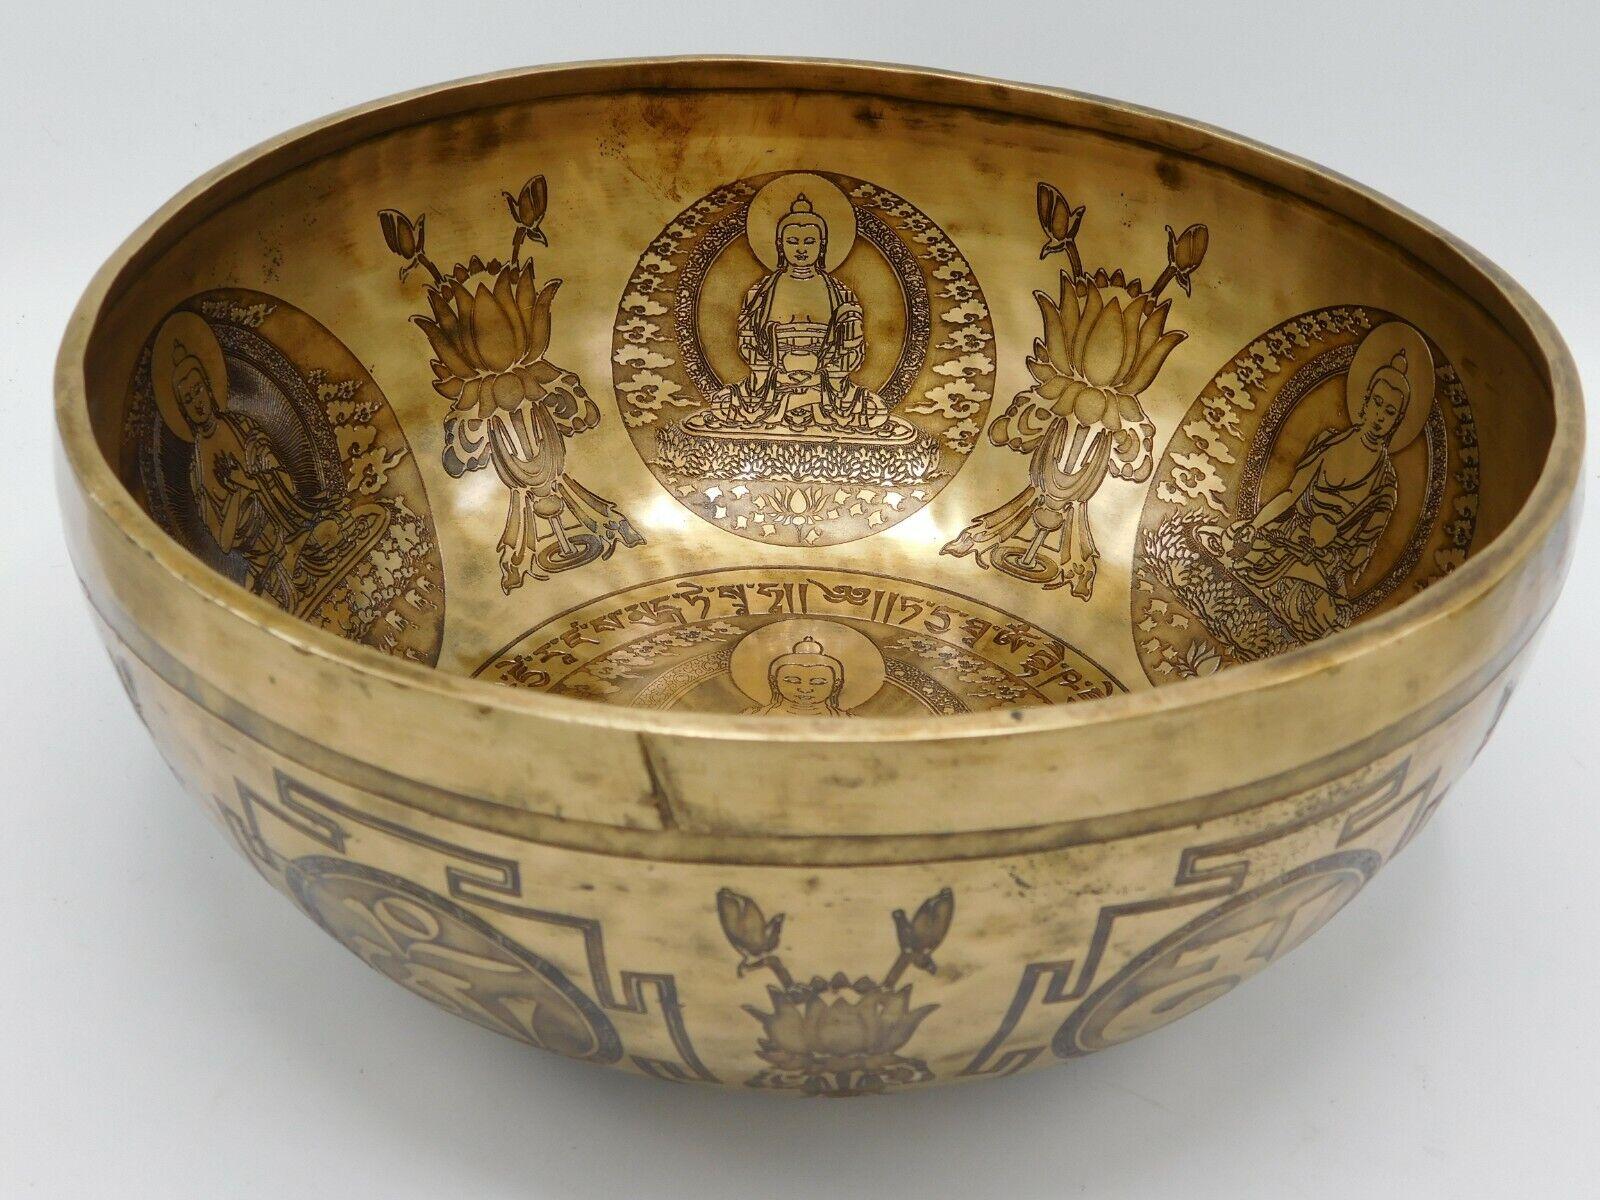 12 inch Buddha in-carve singing bowl - Tibetan bowl for meditation, yoga healing